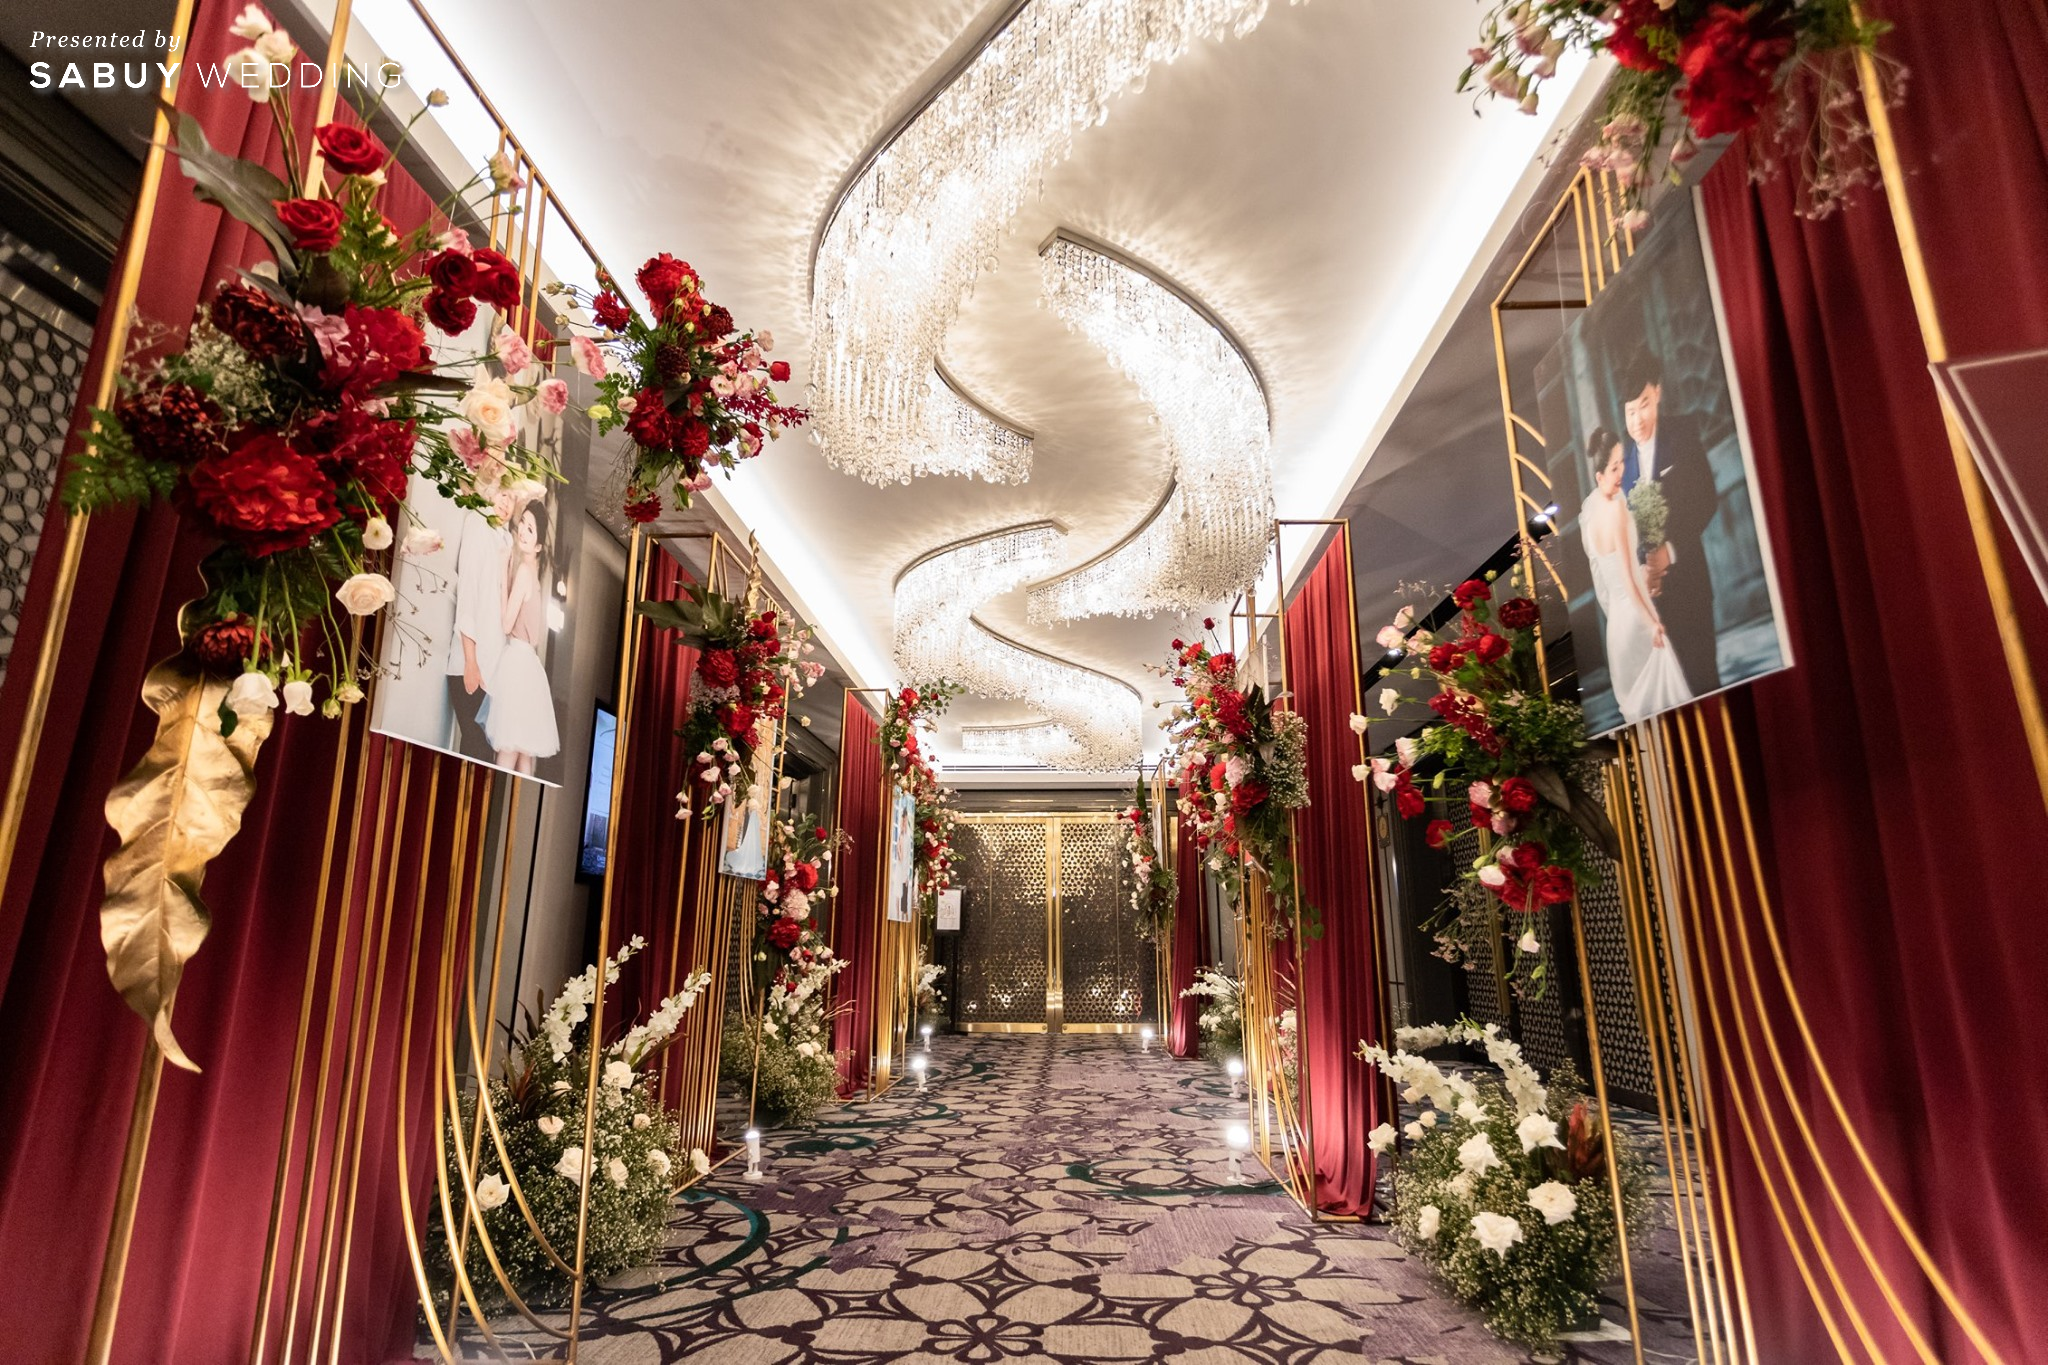 backdrop,แกลอรี่,ตกแต่งงานแต่ง,ออแกไนเซอร์ รีวิวงานแต่งสวยปังดูแพง กับโทนสี Red Burgundy @ Chatrium Hotel Riverside Bangkok